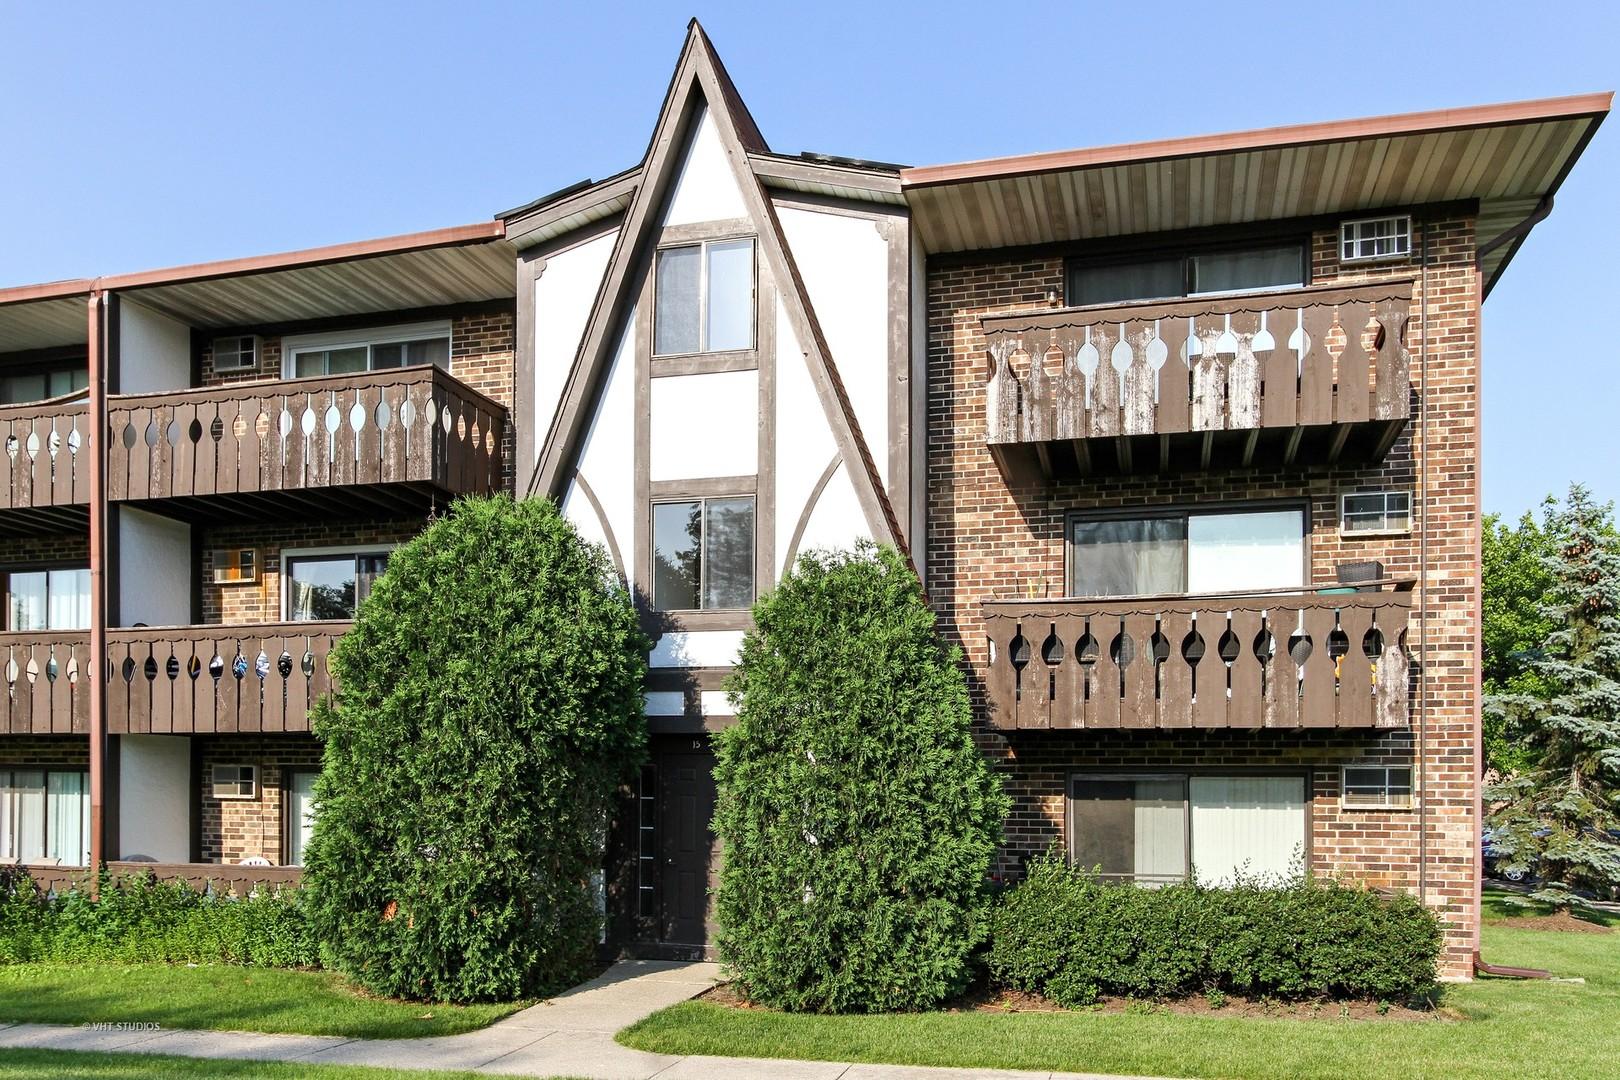 15 Crestview Lane, Unit 11, Vernon Hills, Illinois 60061